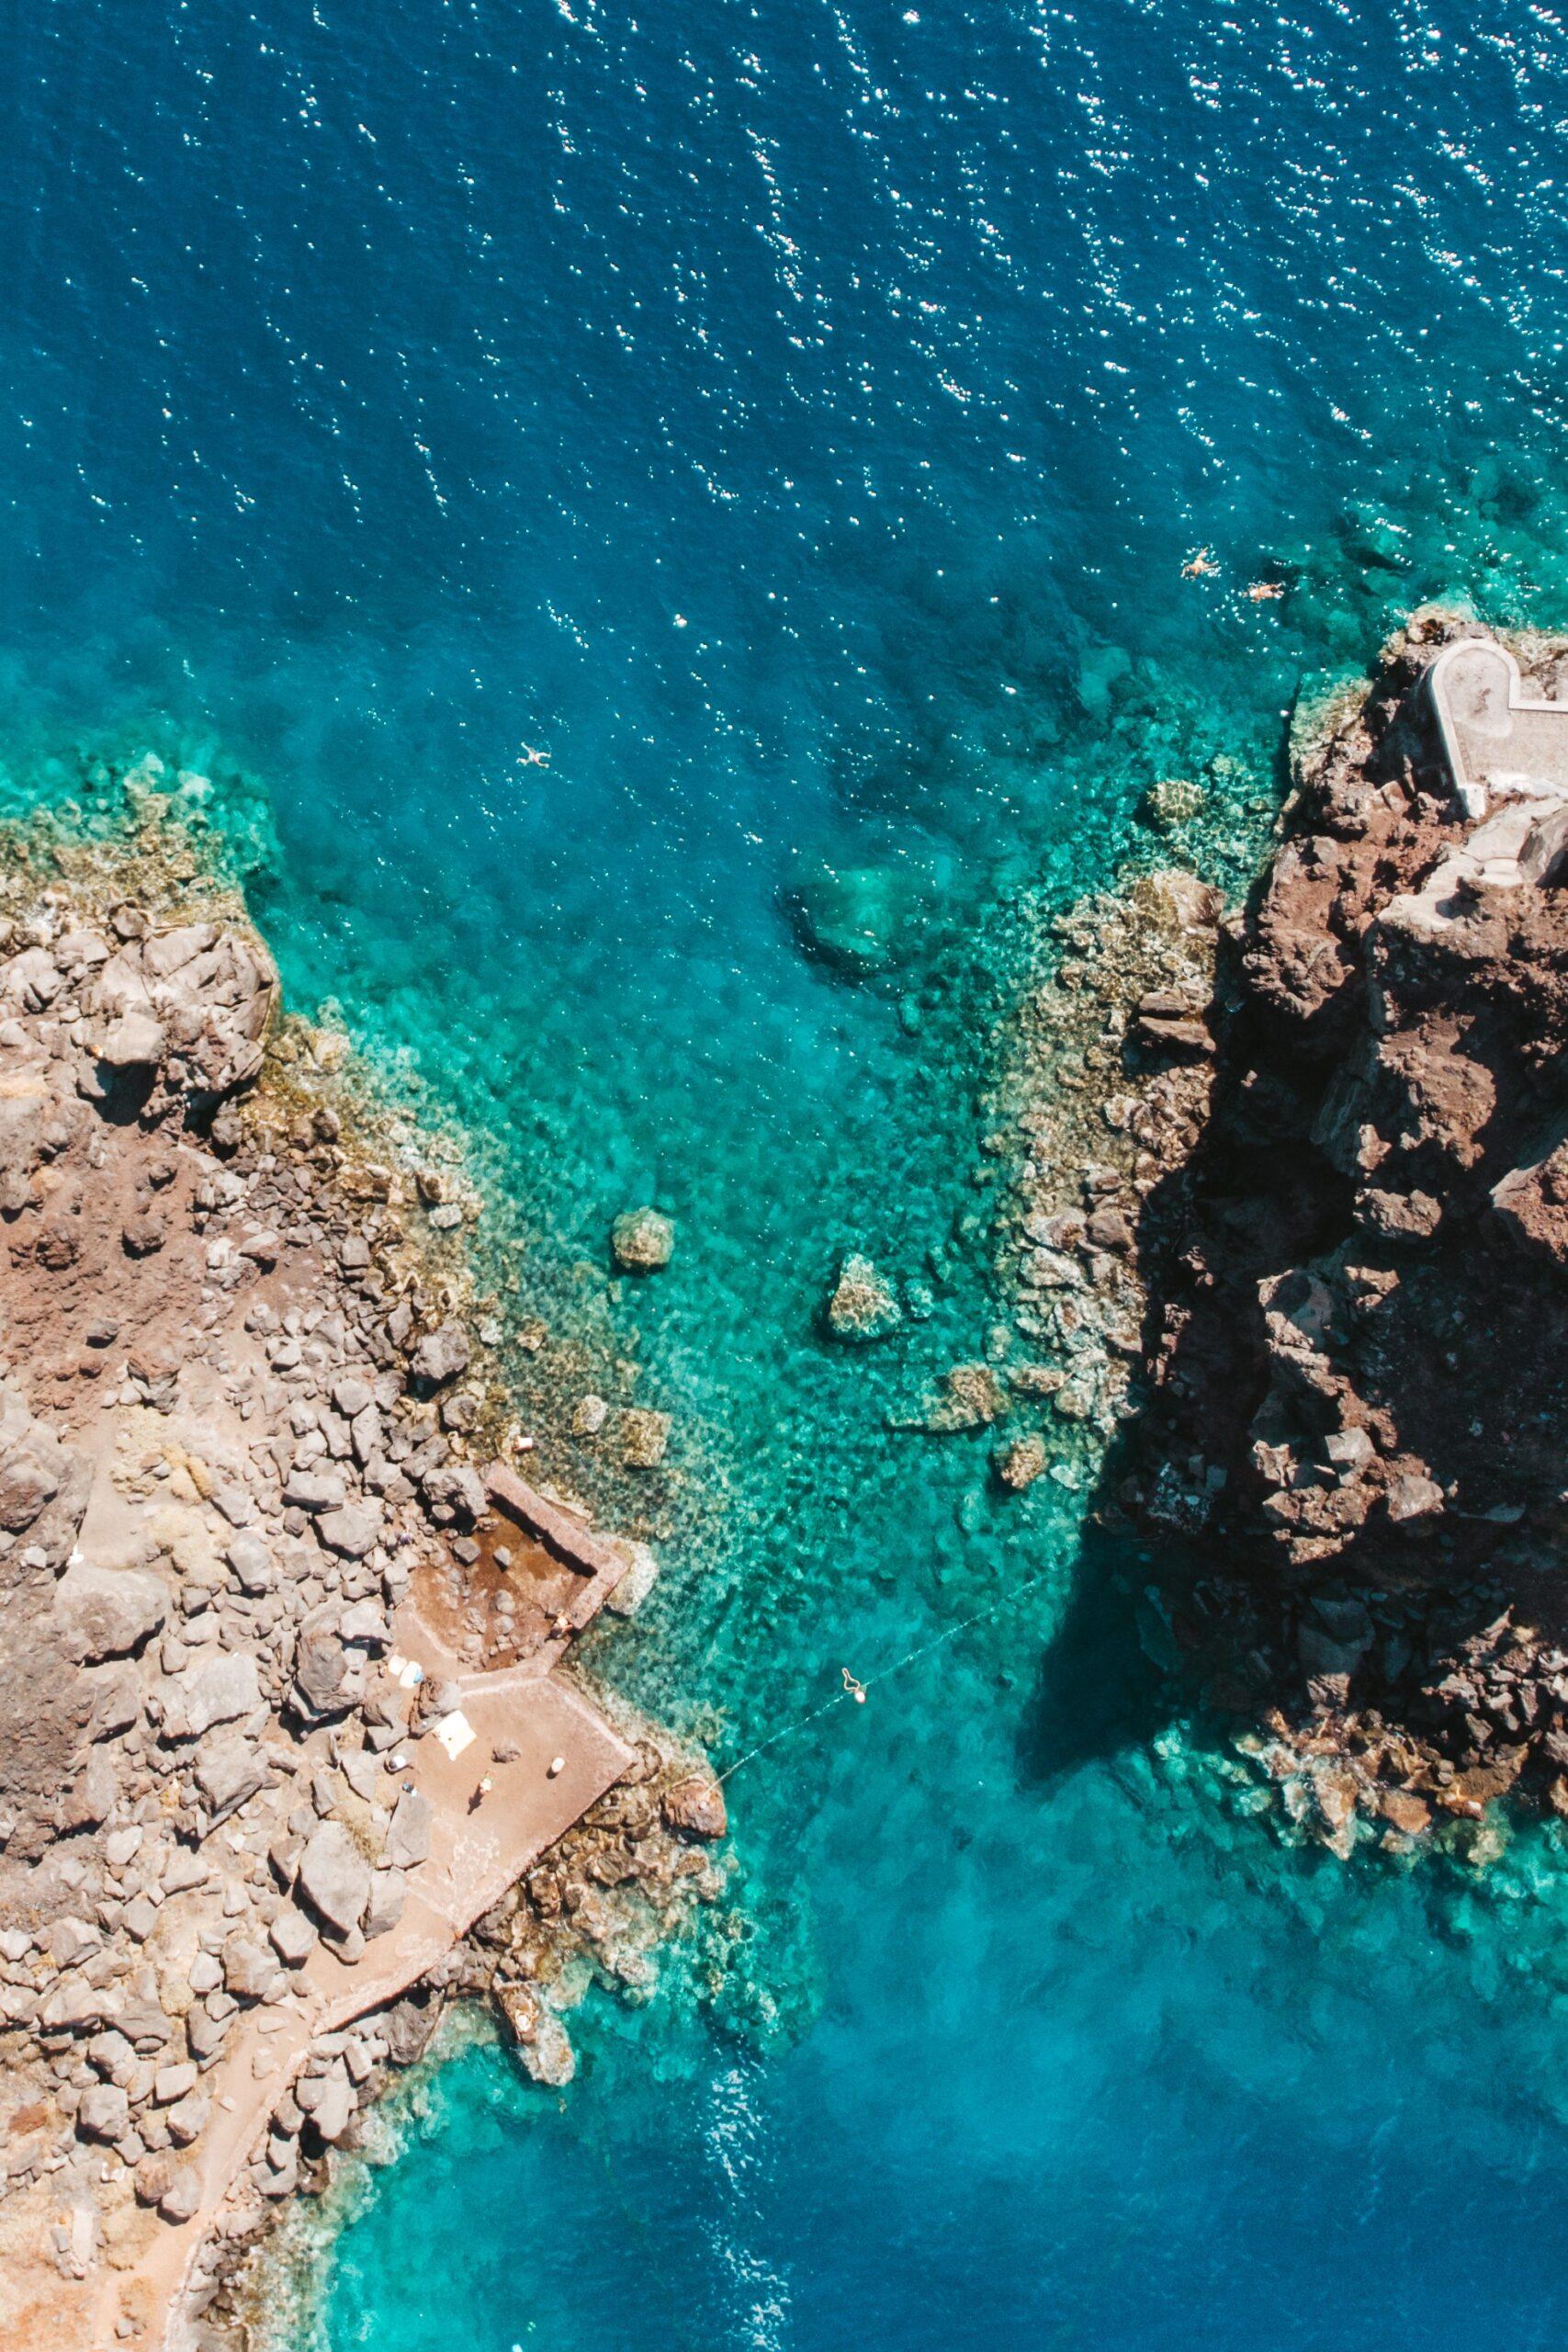 Agios Nikolaos o Peramataris, caldera Oia, kaldera Santorini, water, sea, Agios Nikolaos island, wyspa Agios Nikolaos